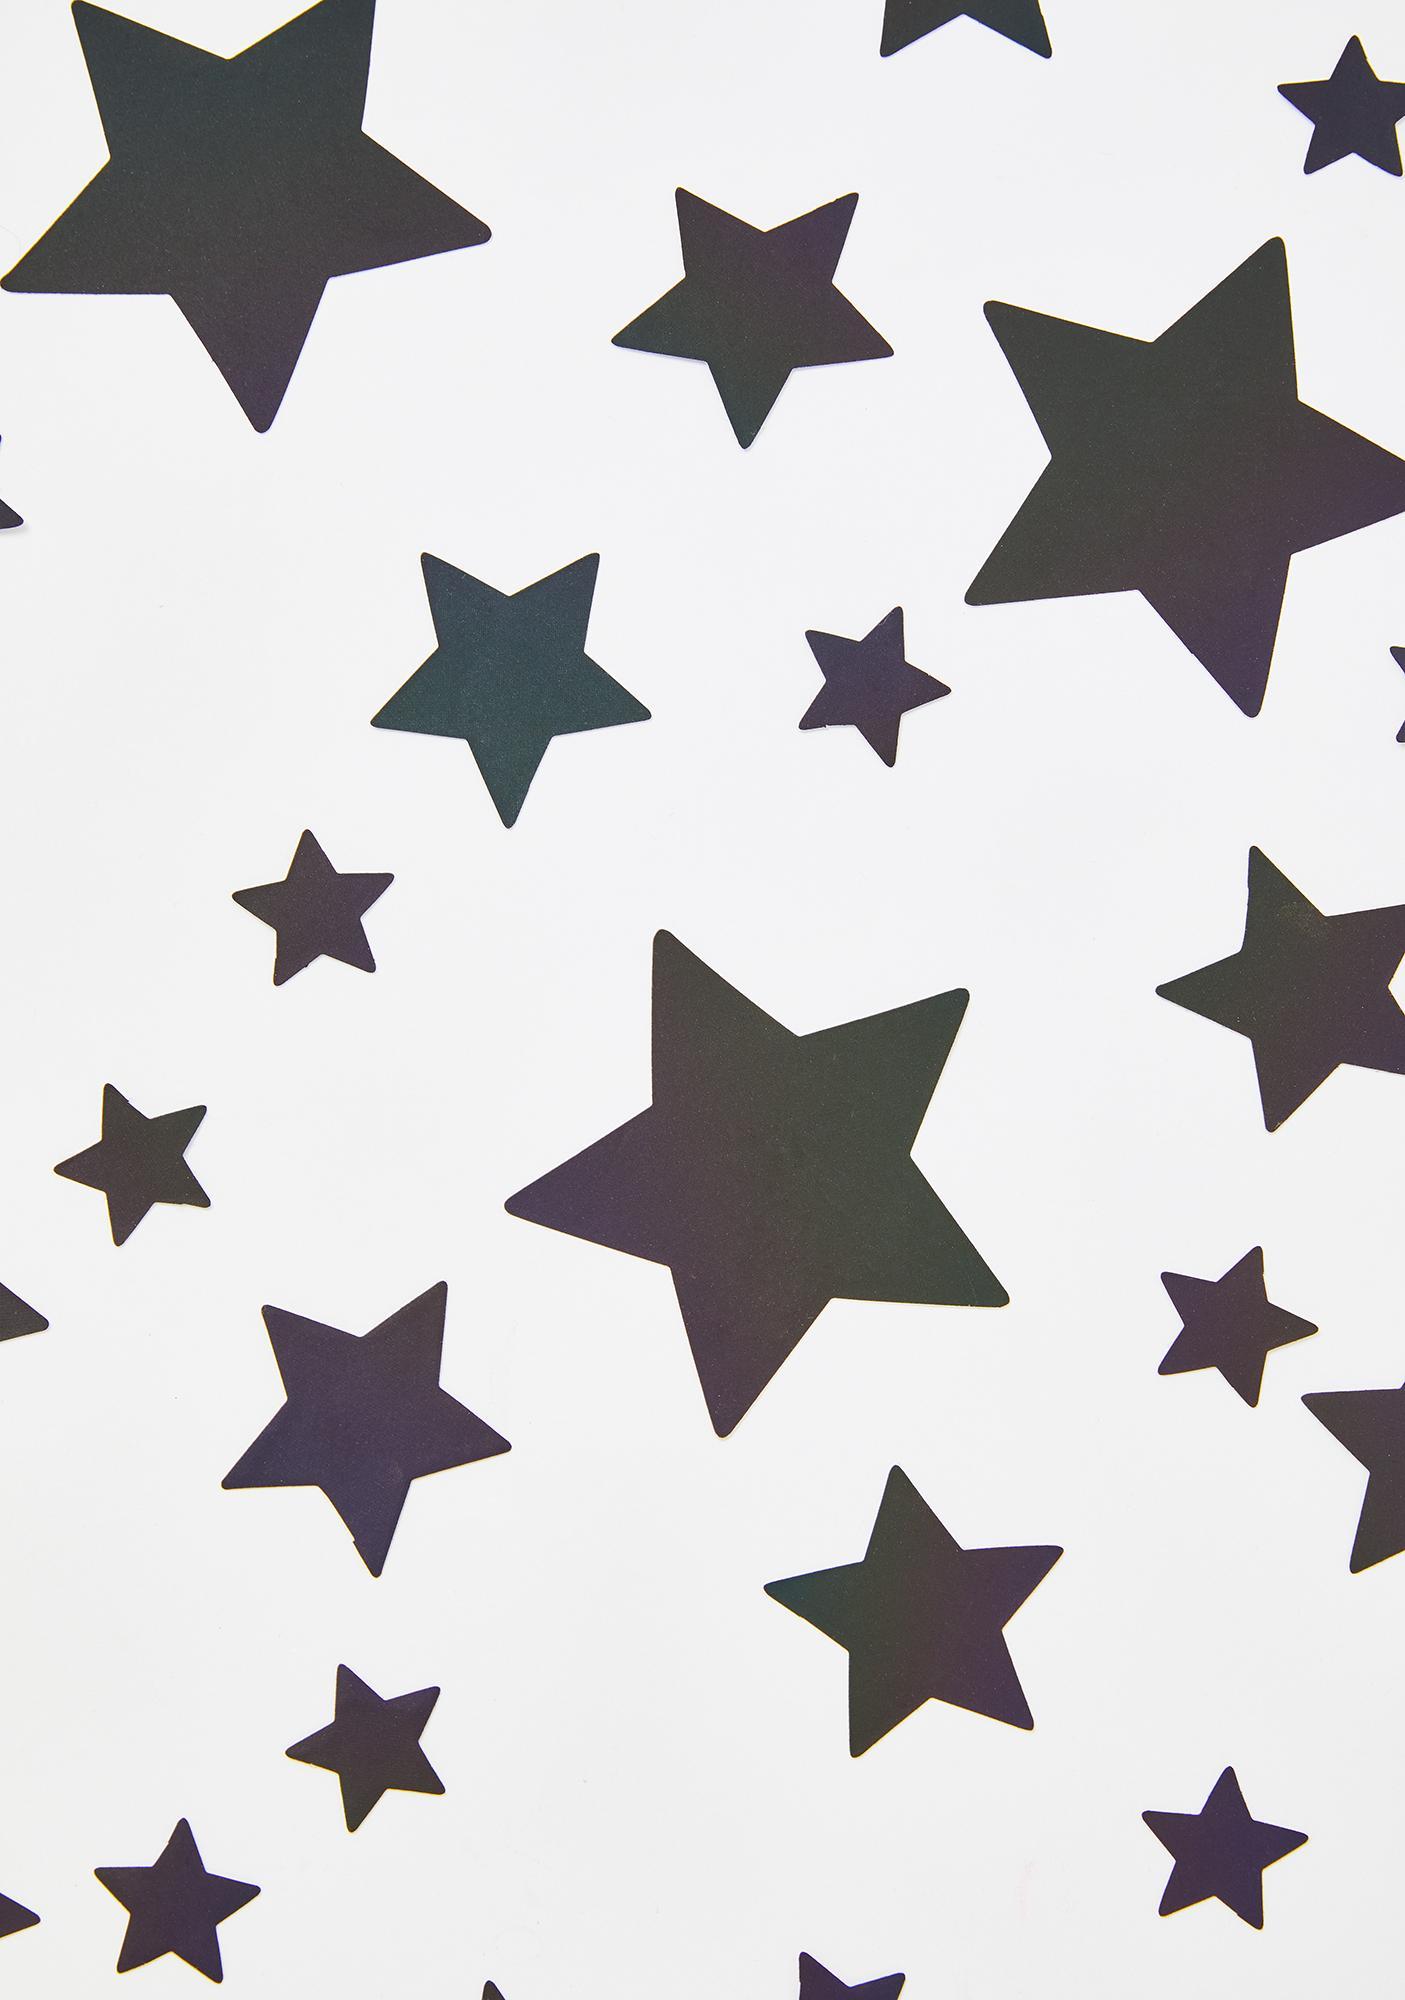 Neva Nude Rainbow Reflective 35 Star Bundle Pasties